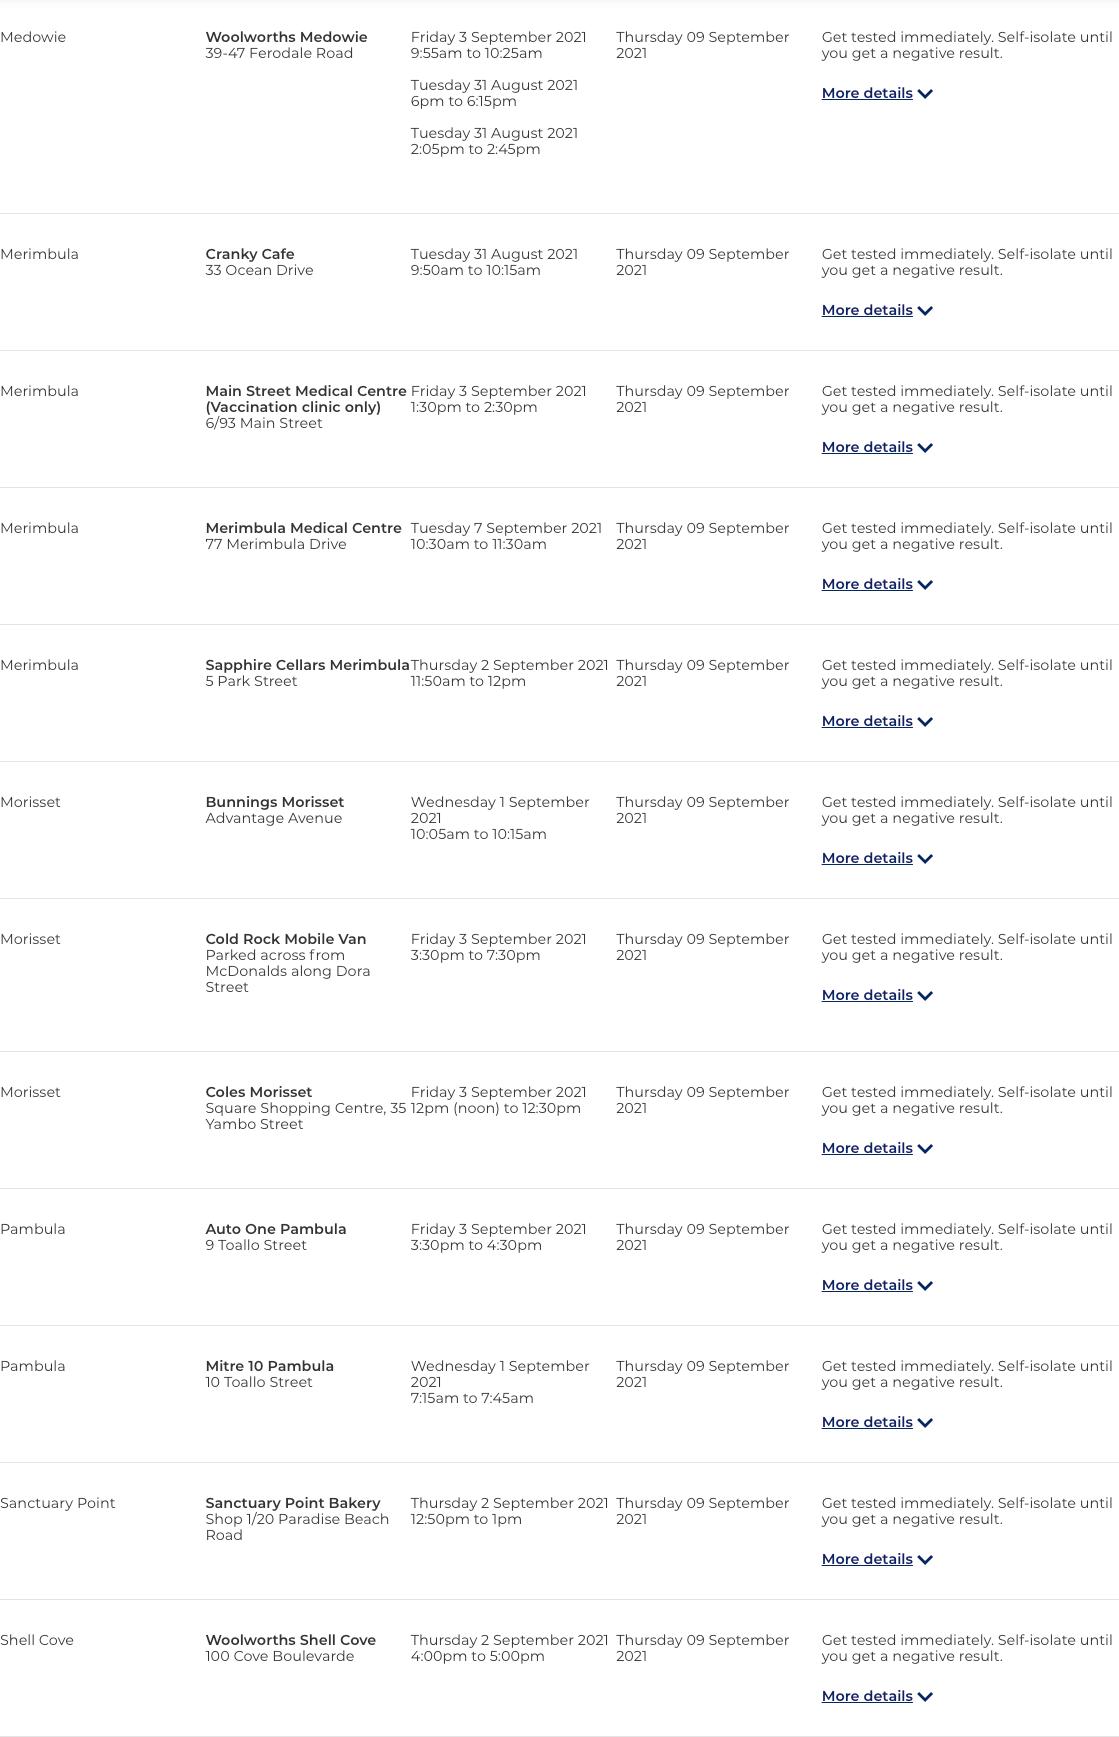 www.nsw.gov.au_covid-19_nsw-covid-19-case-locations_case-locations (20)的副本.png